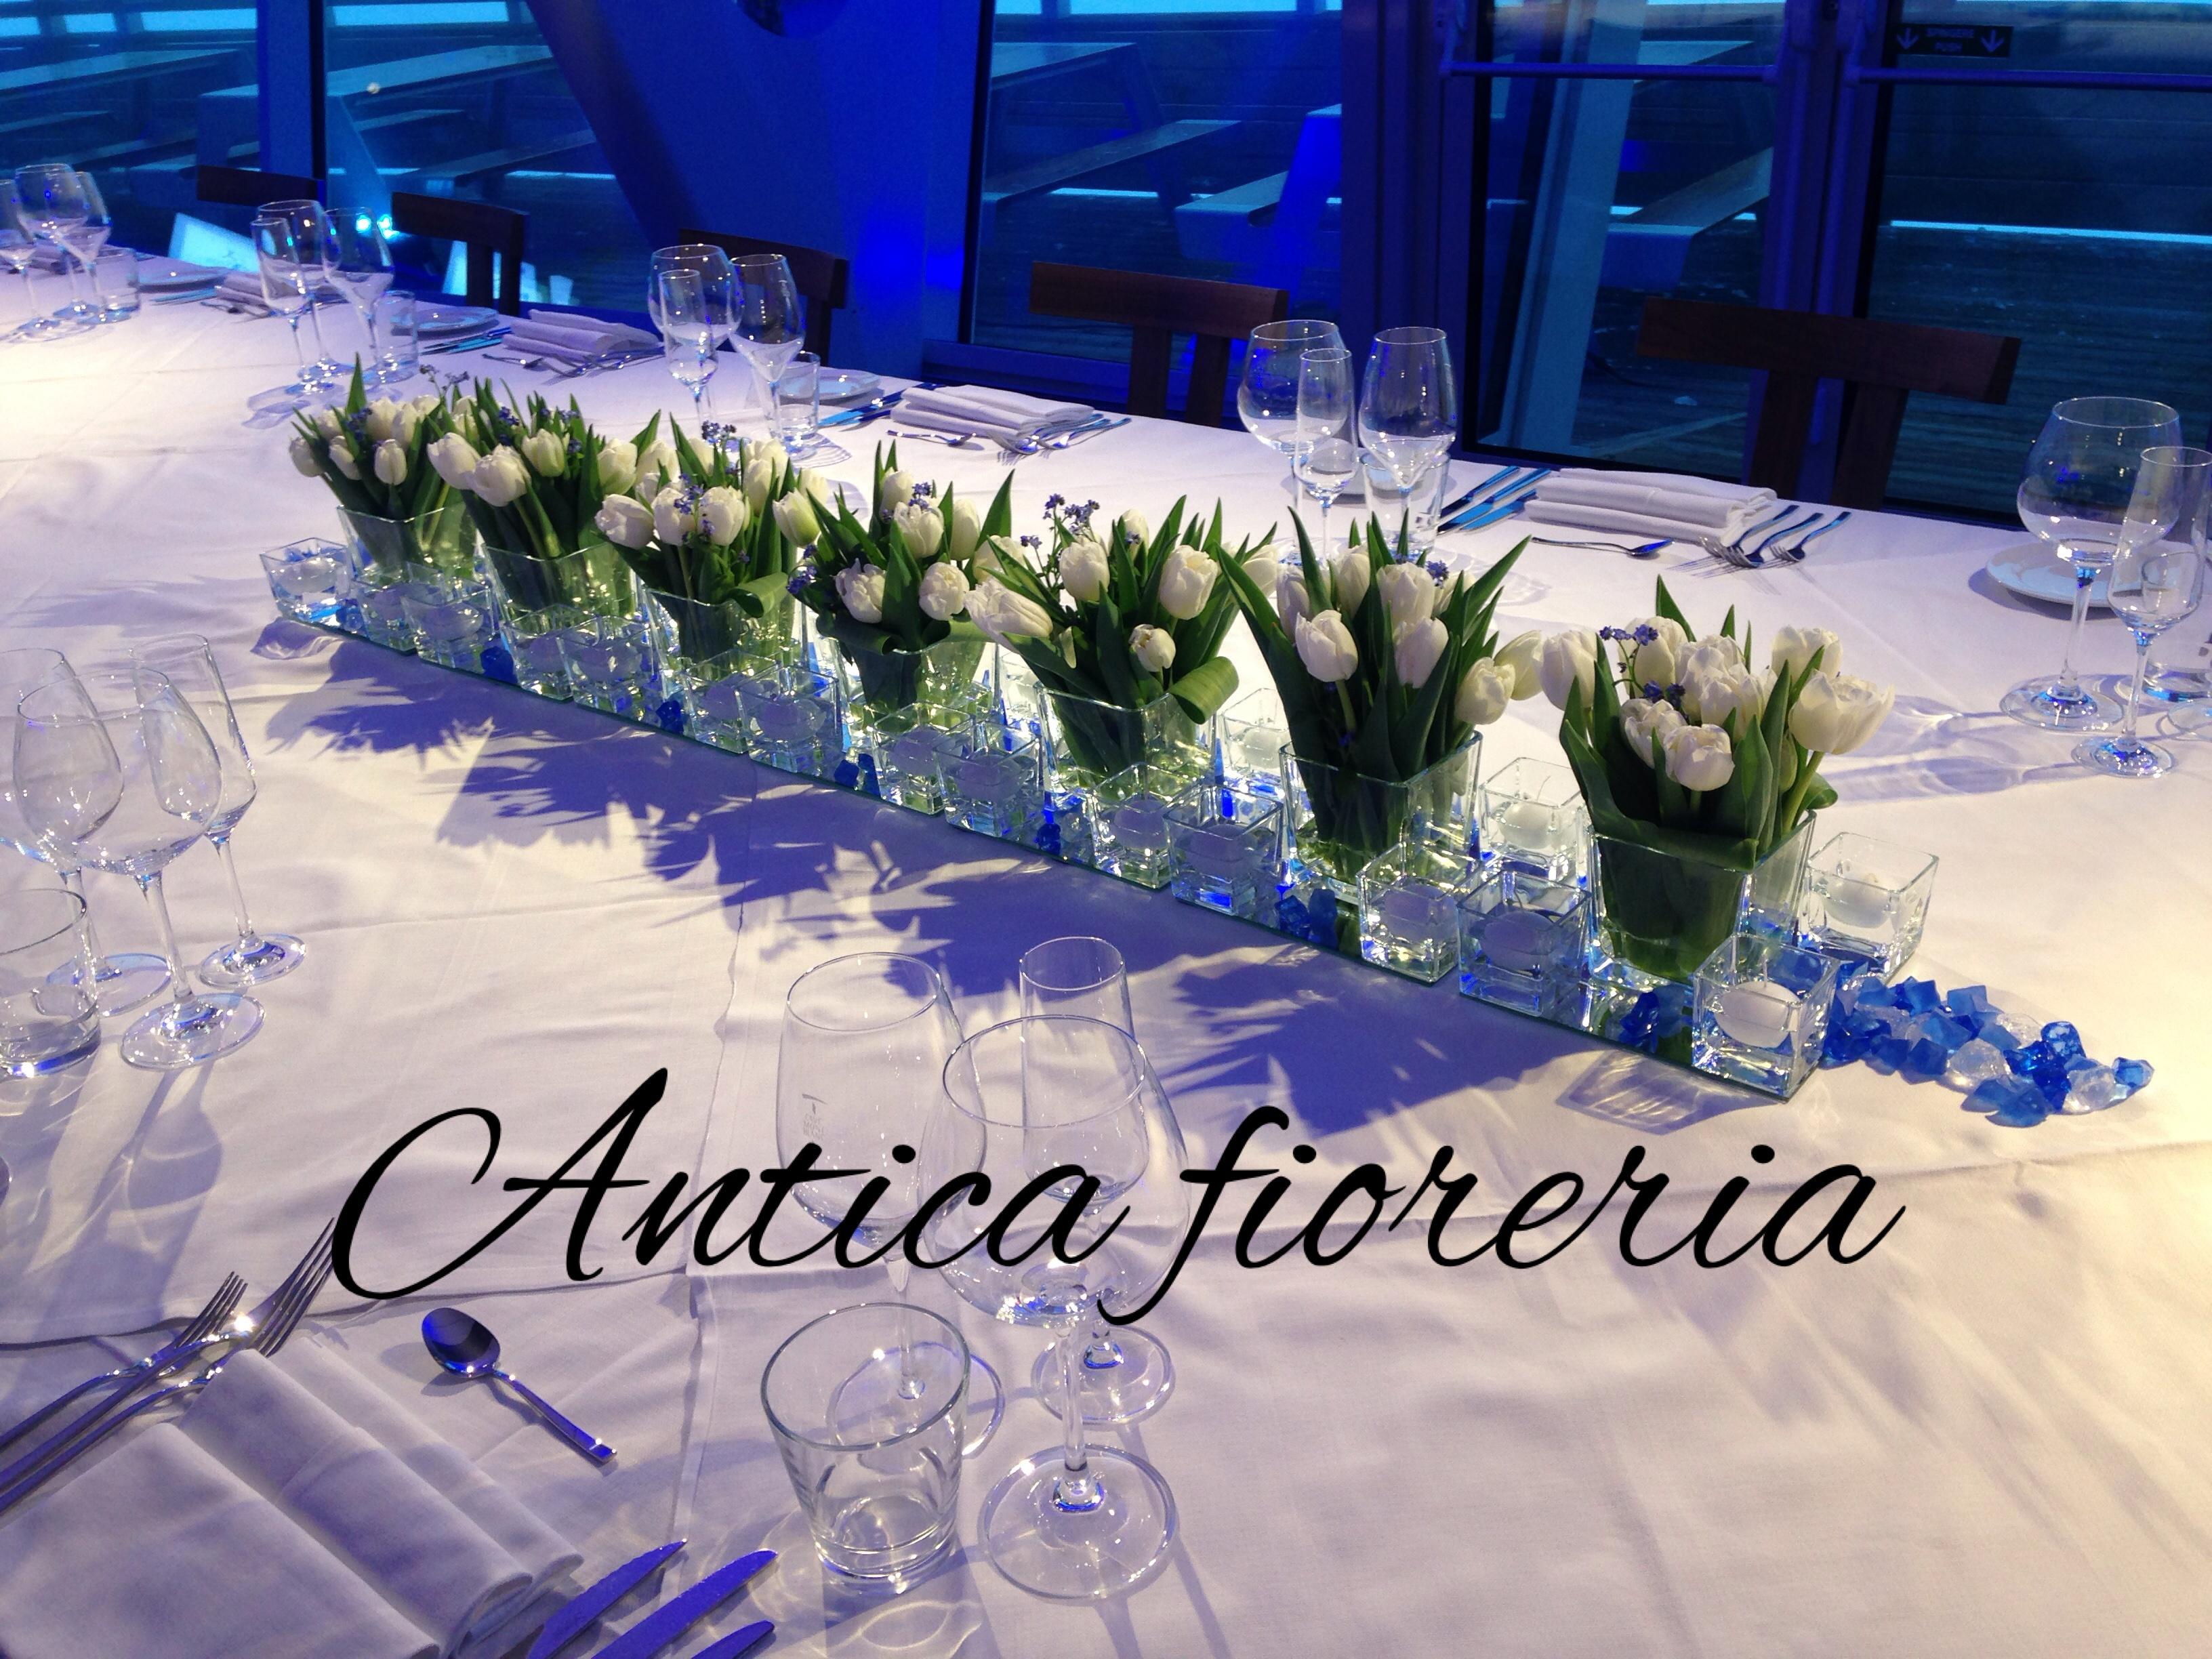 tavolo imperiale cena di gala Courmayeur